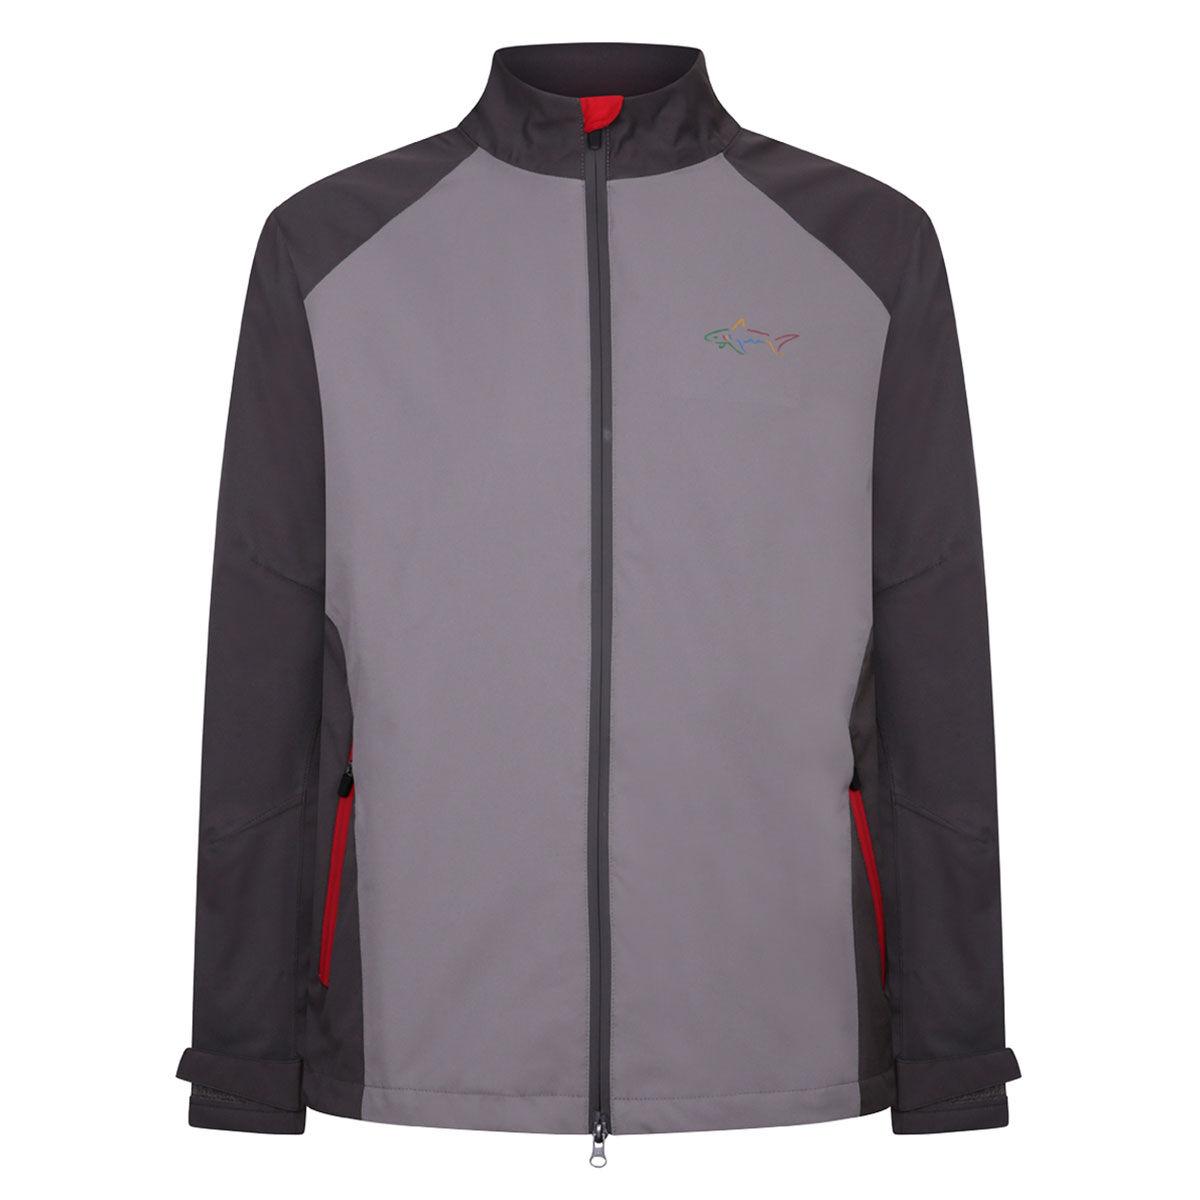 Greg Norman Dorsal Waterproof Golf Jacket, Mens, Charcoal/grey, Large   American Golf